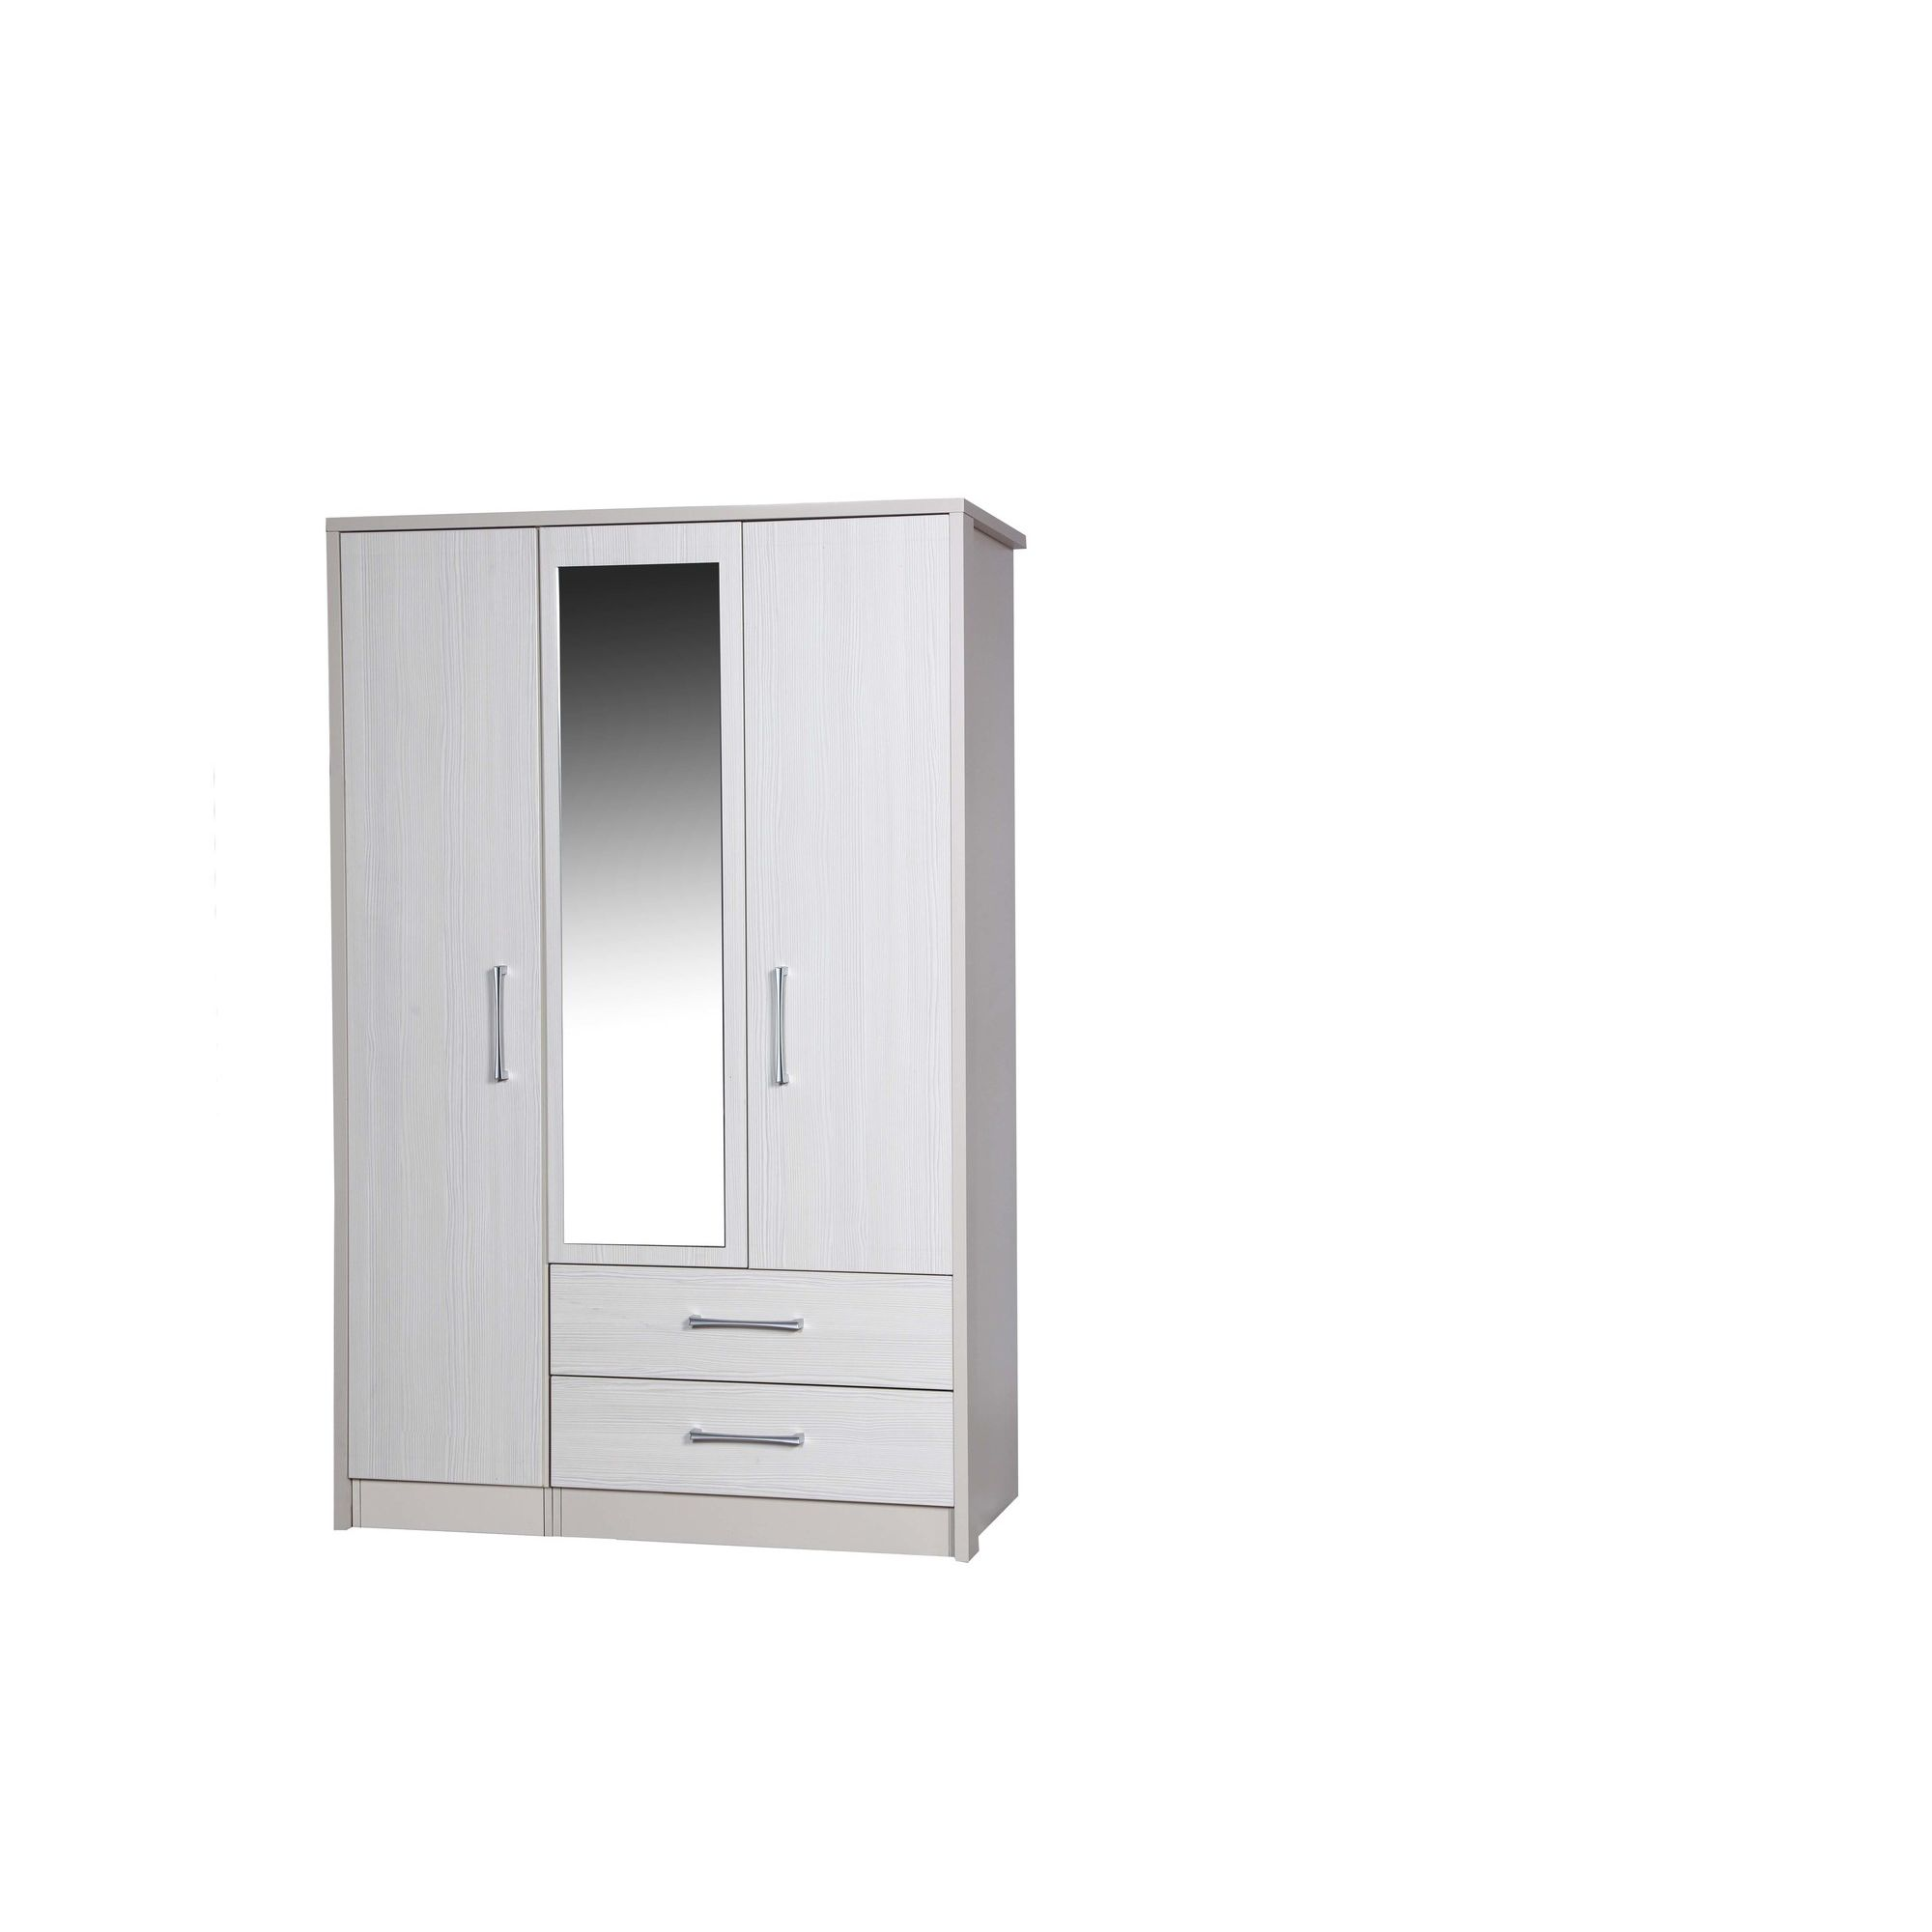 Alto Furniture Avola 3 Door Combi Wardrobe with Mirror - Cream Carcass With White Avola at Tesco Direct